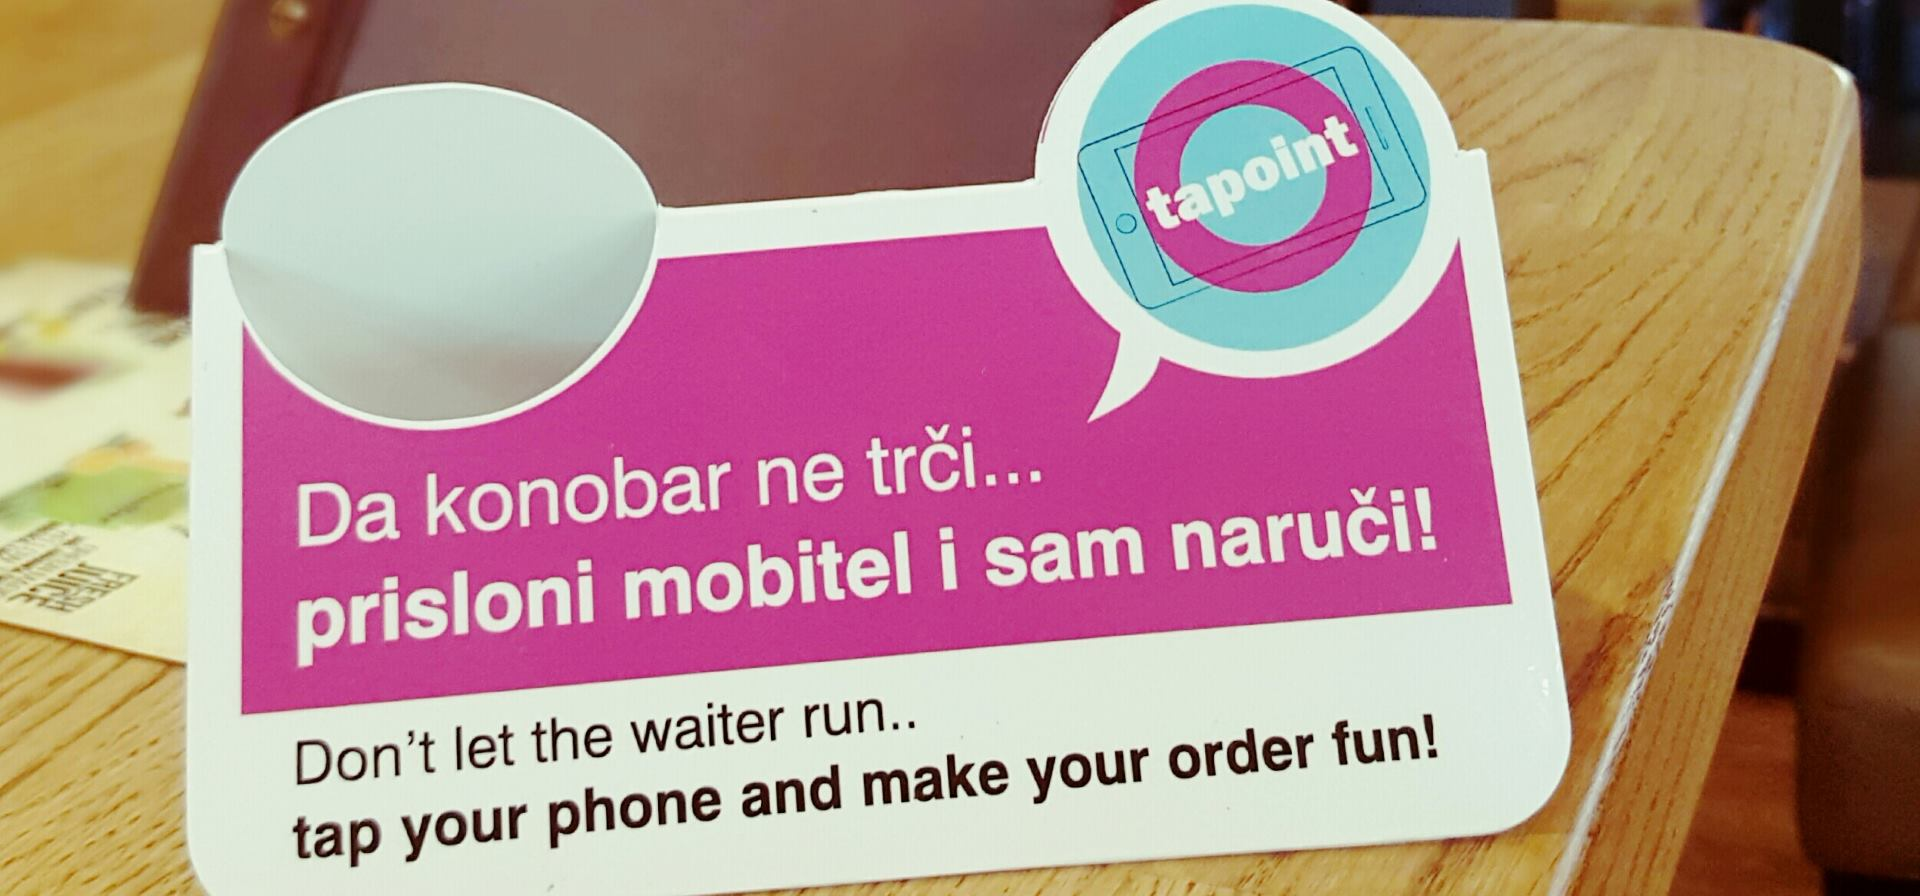 VIDEO: TAPOINT mobilno bezkontaktno naručivanje u VIVAS barovima